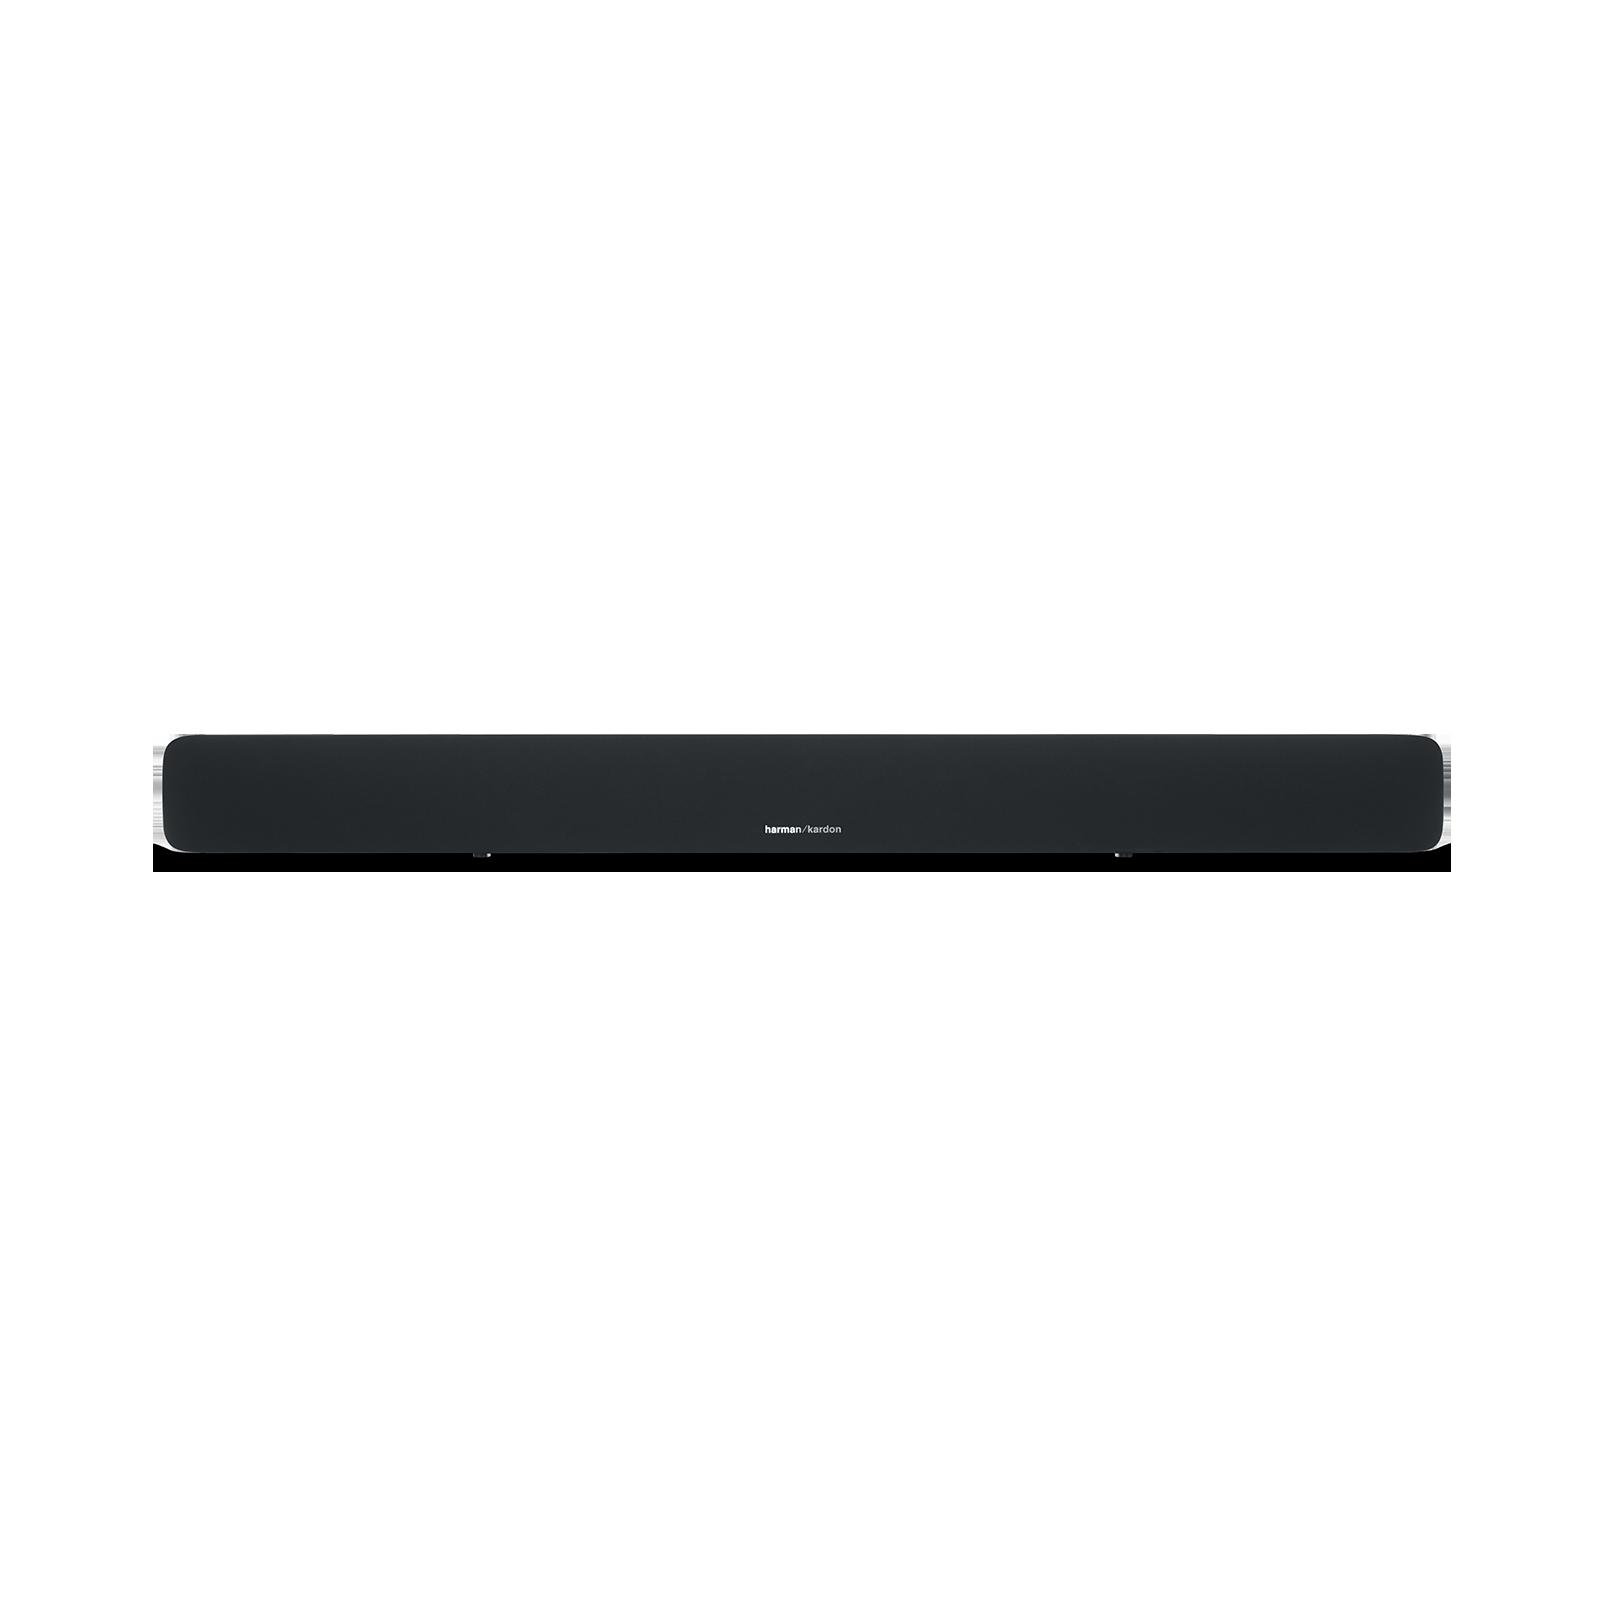 HK SB20 - Black - Advanced soundbar with Bluetooth and powerful wireless subwoofer - Detailshot 4